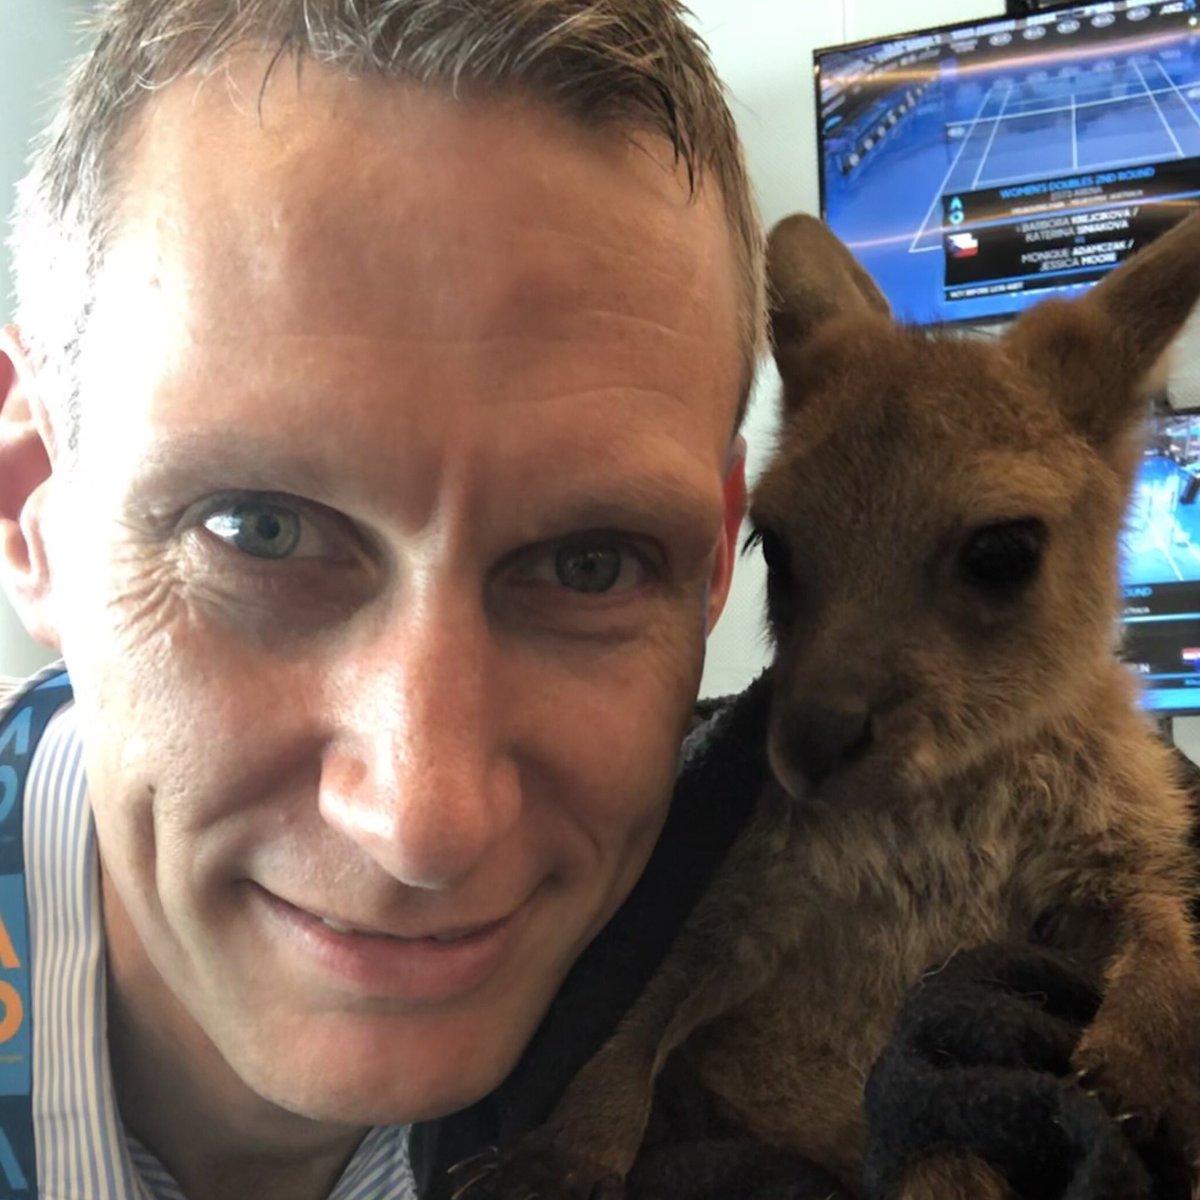 RT @DavidLawTennis: Got a new mate. He supports @wba so we should be ok. https://t.co/YhflhvLGuh